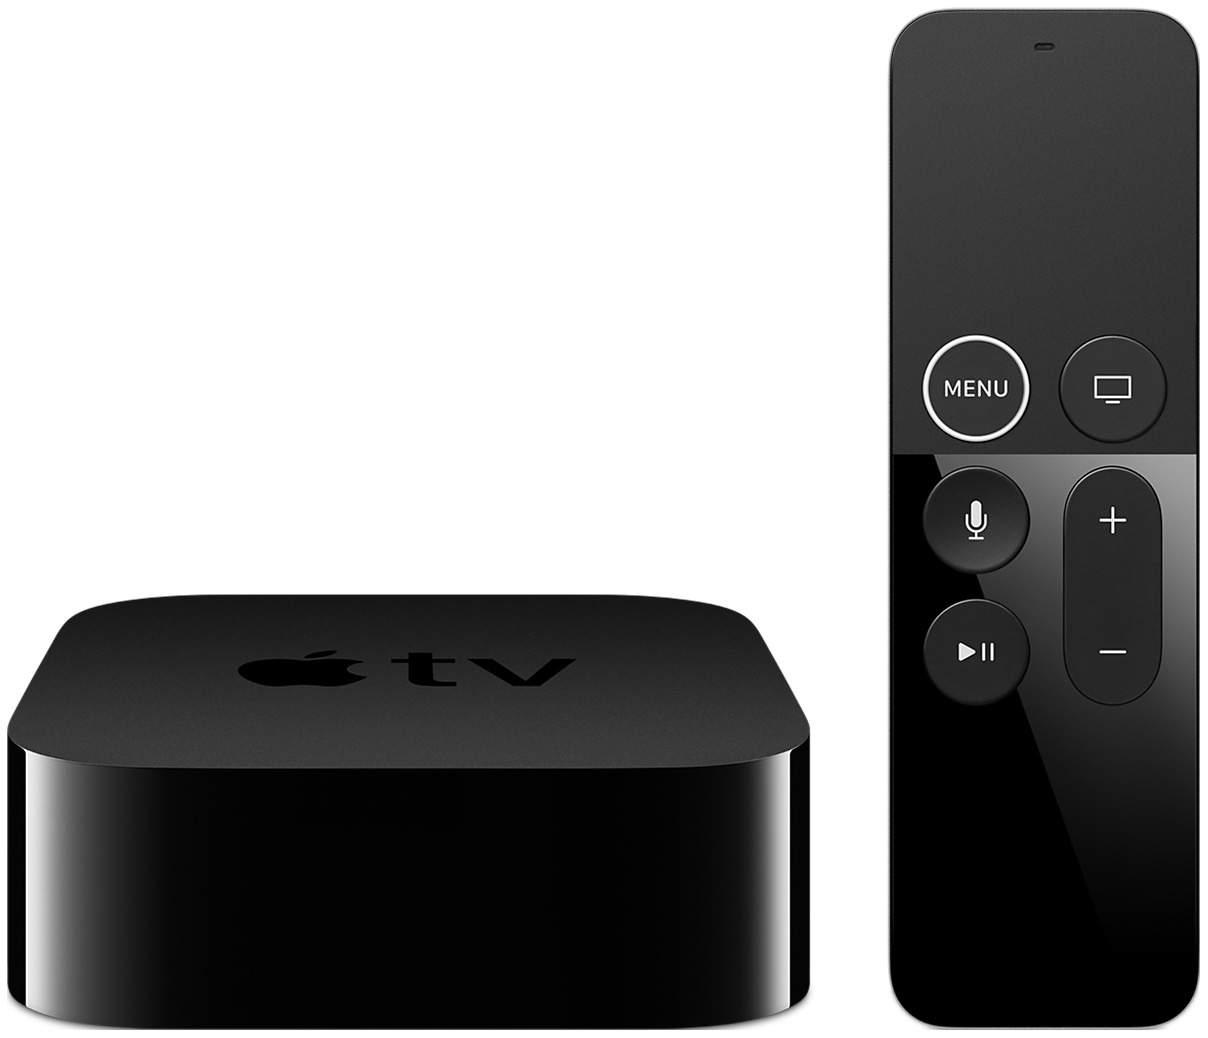 Телевизионная приставка Apple TV 4K 64GB (MP7P2RS/A)